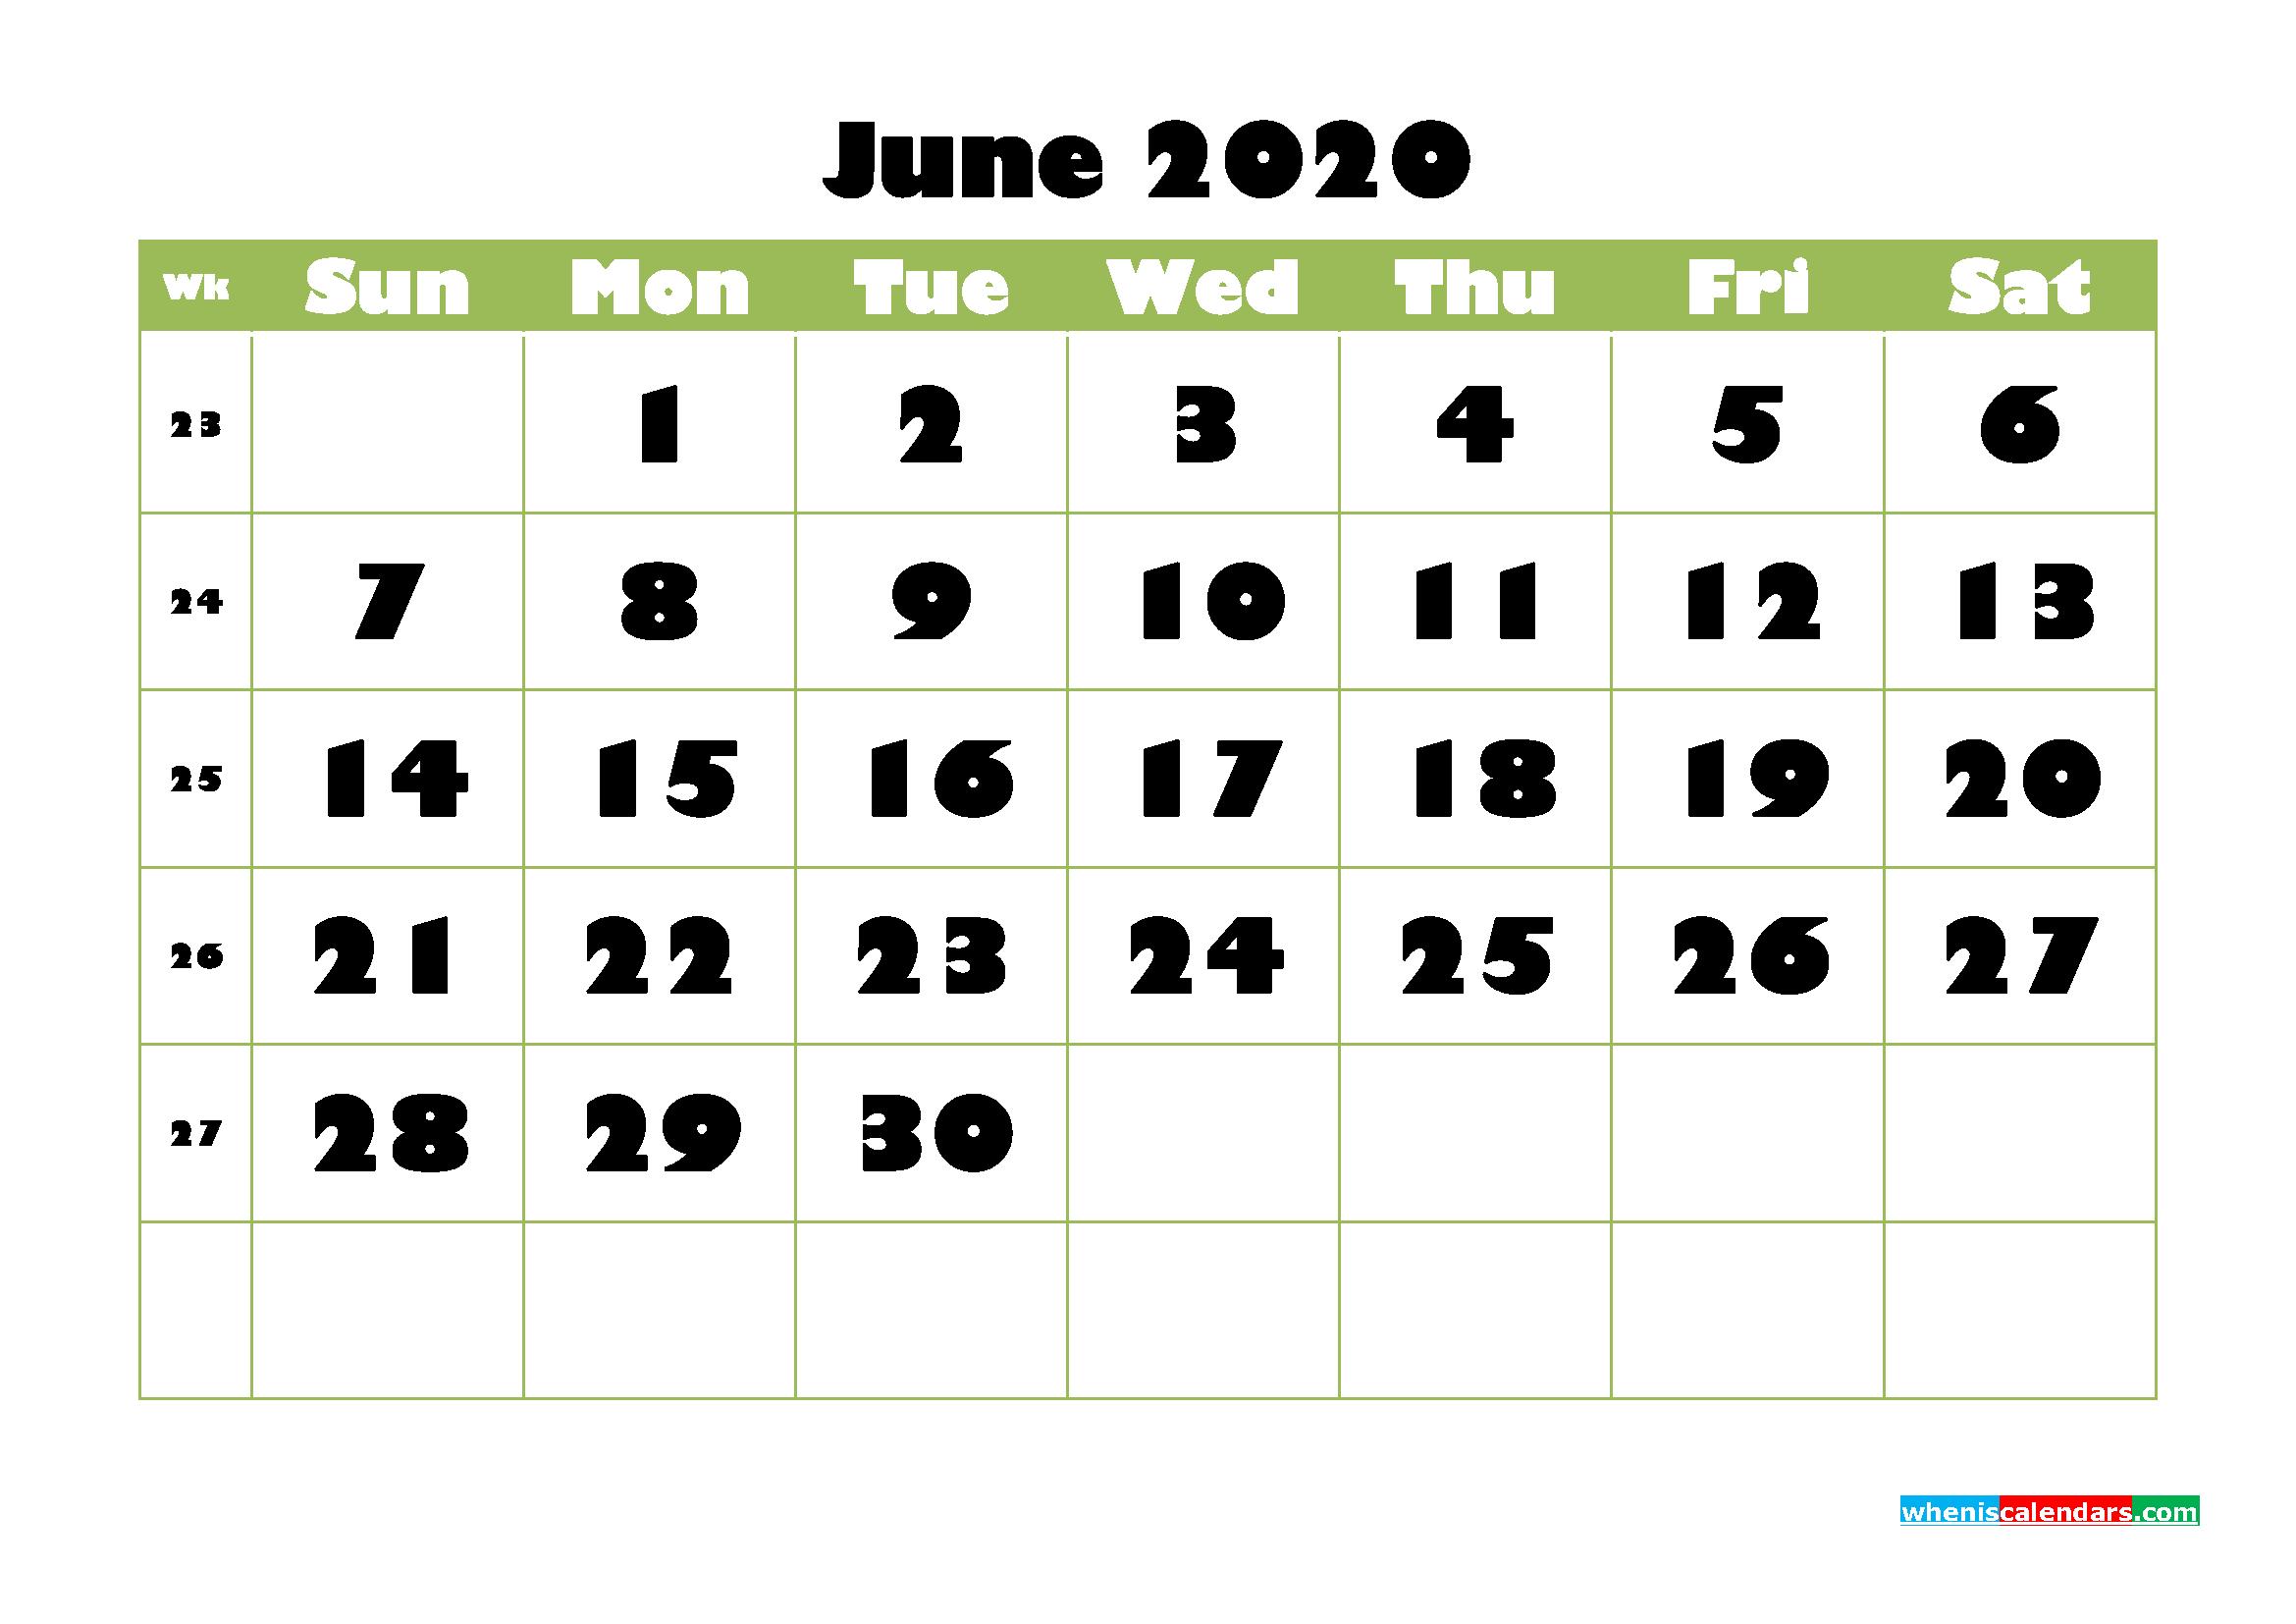 June Printable Calendar 2020 PDF, Word - No.m20b738